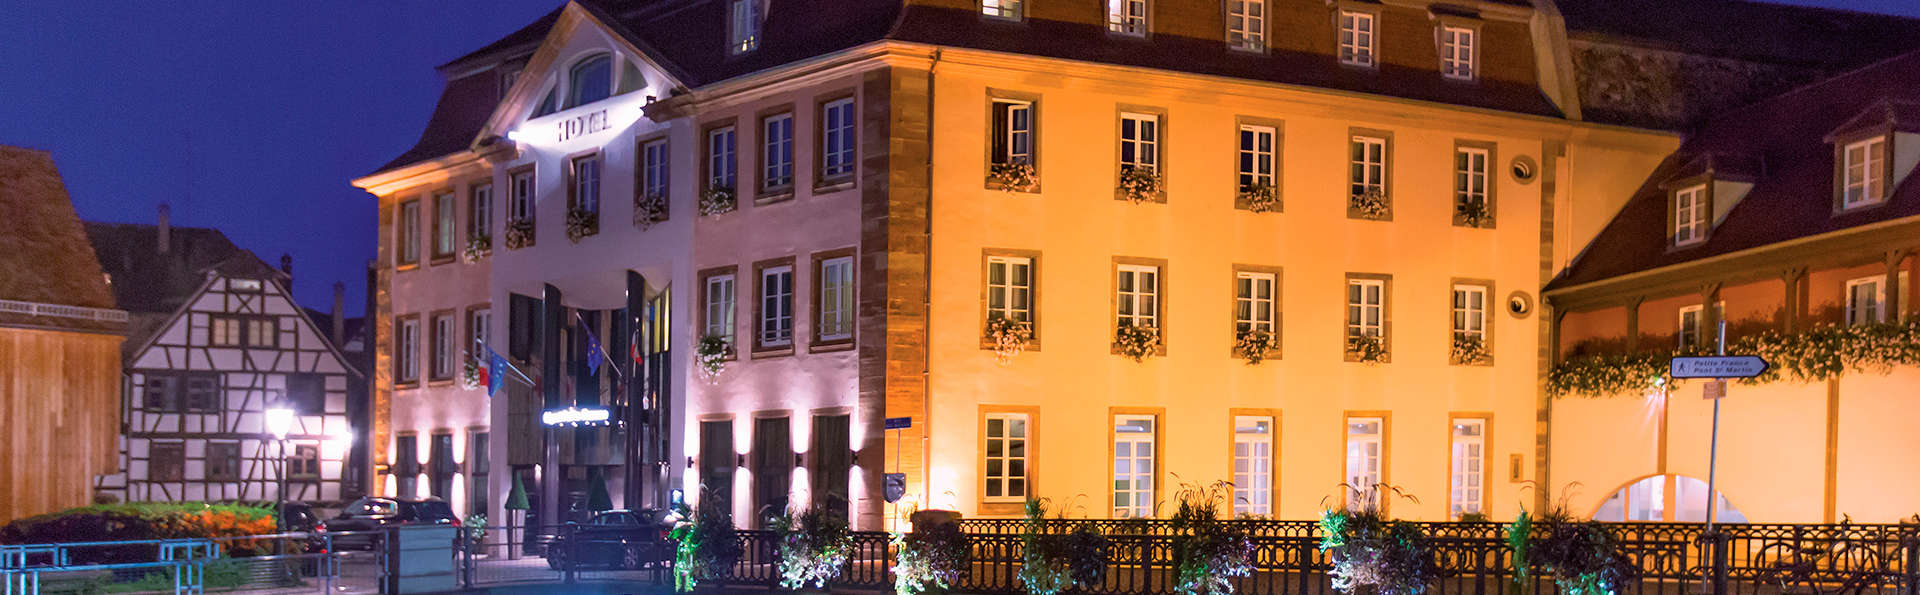 Régent Petite France & Spa - edit_Facade_avant_1_nuit_ZVADRON_Frantisek.jpg